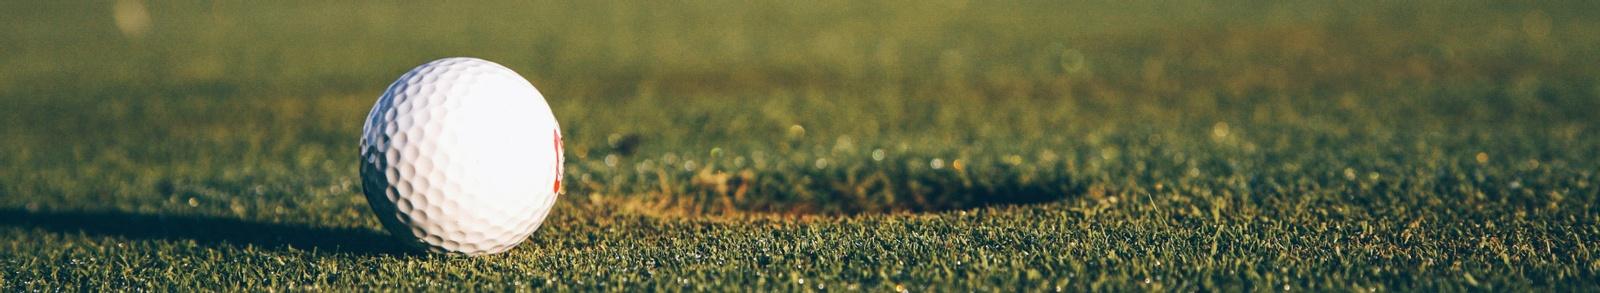 Old Rivals Meet Again: MTC vs. Skinners Golf Report  banner